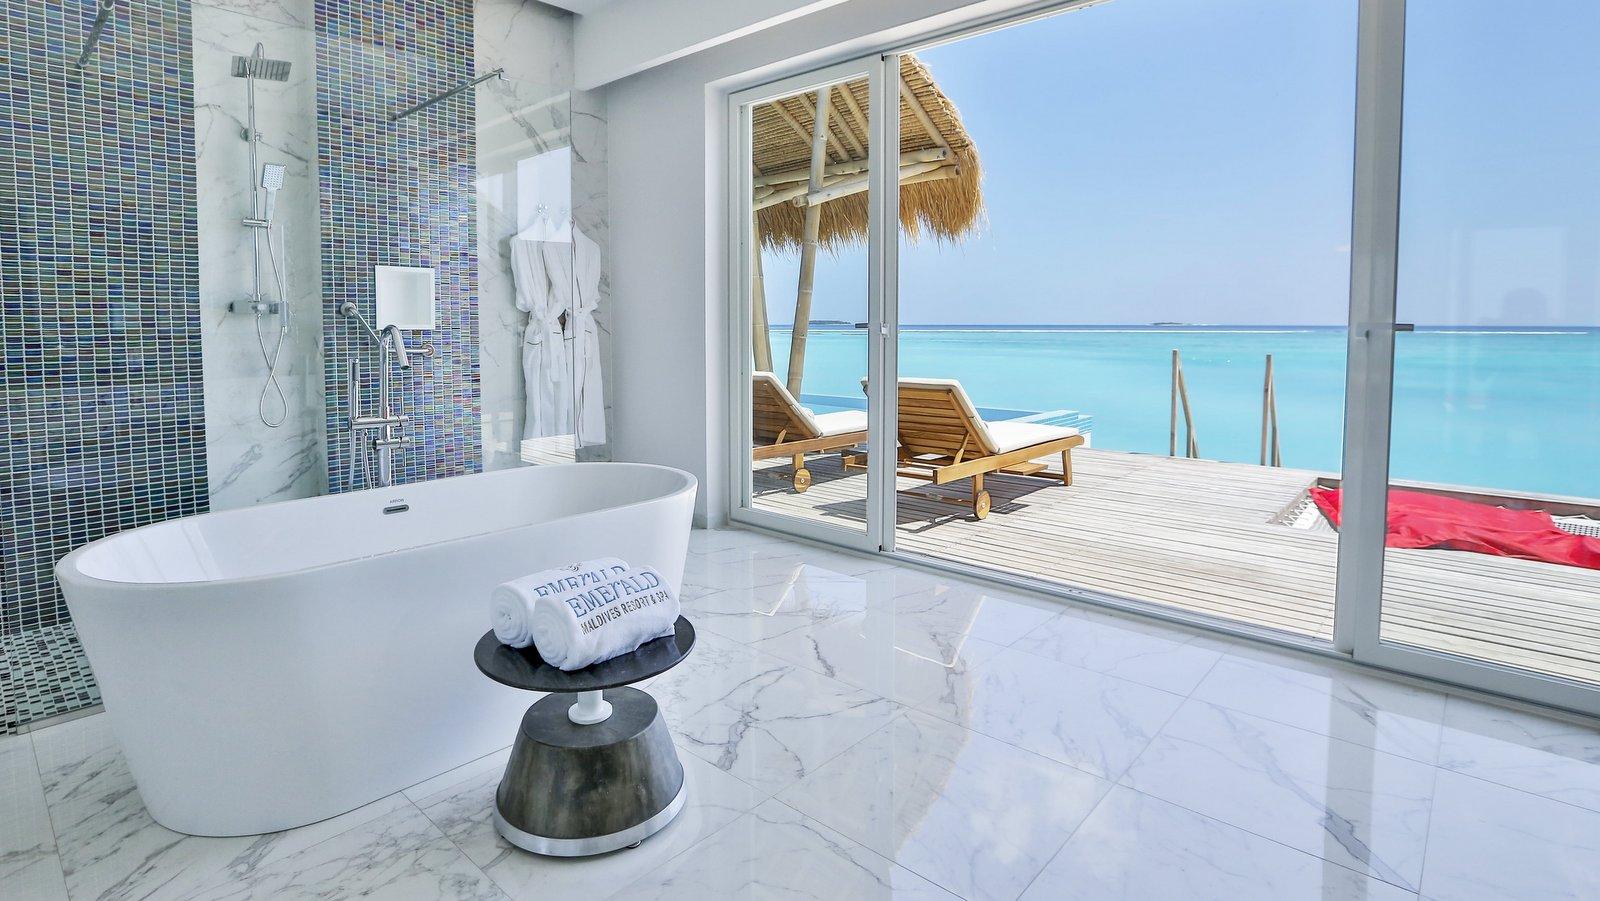 Мальдивы, отель Emerald Maldives Resort & Spa, номер Water Villa with Pool